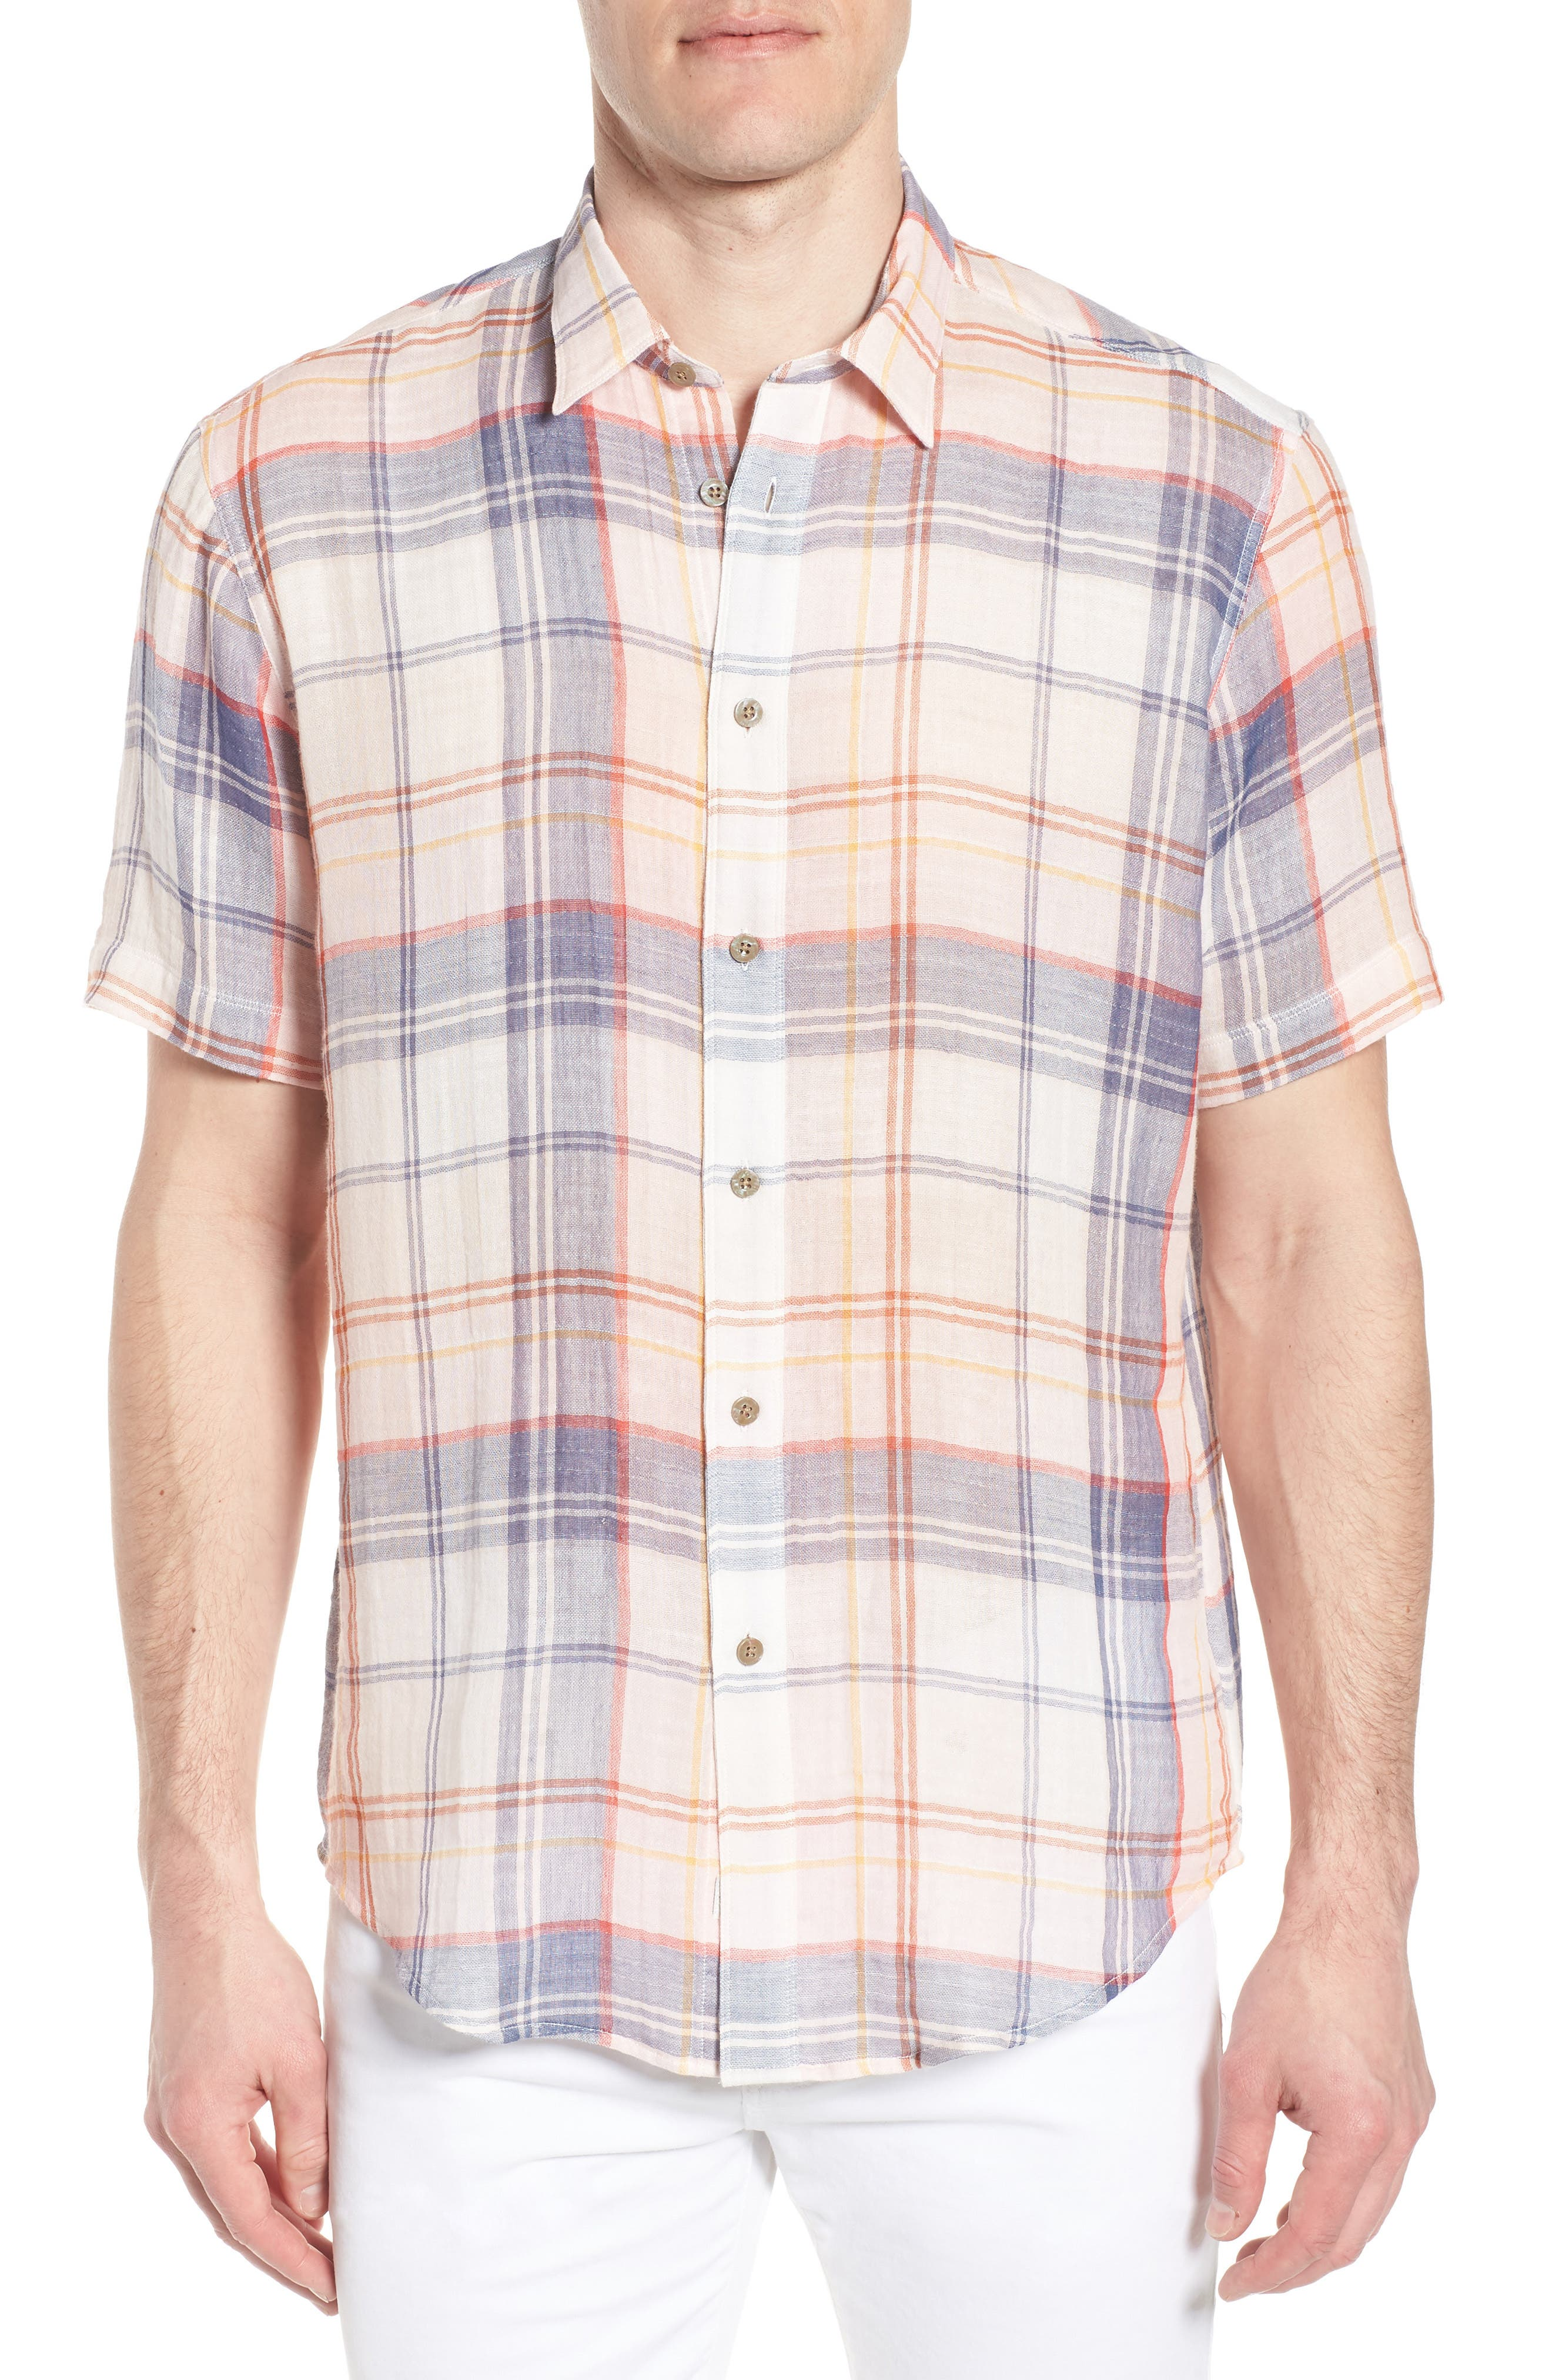 Tradewinds Regular Fit Short Sleeve Sport Shirt,                             Main thumbnail 1, color,                             Rose